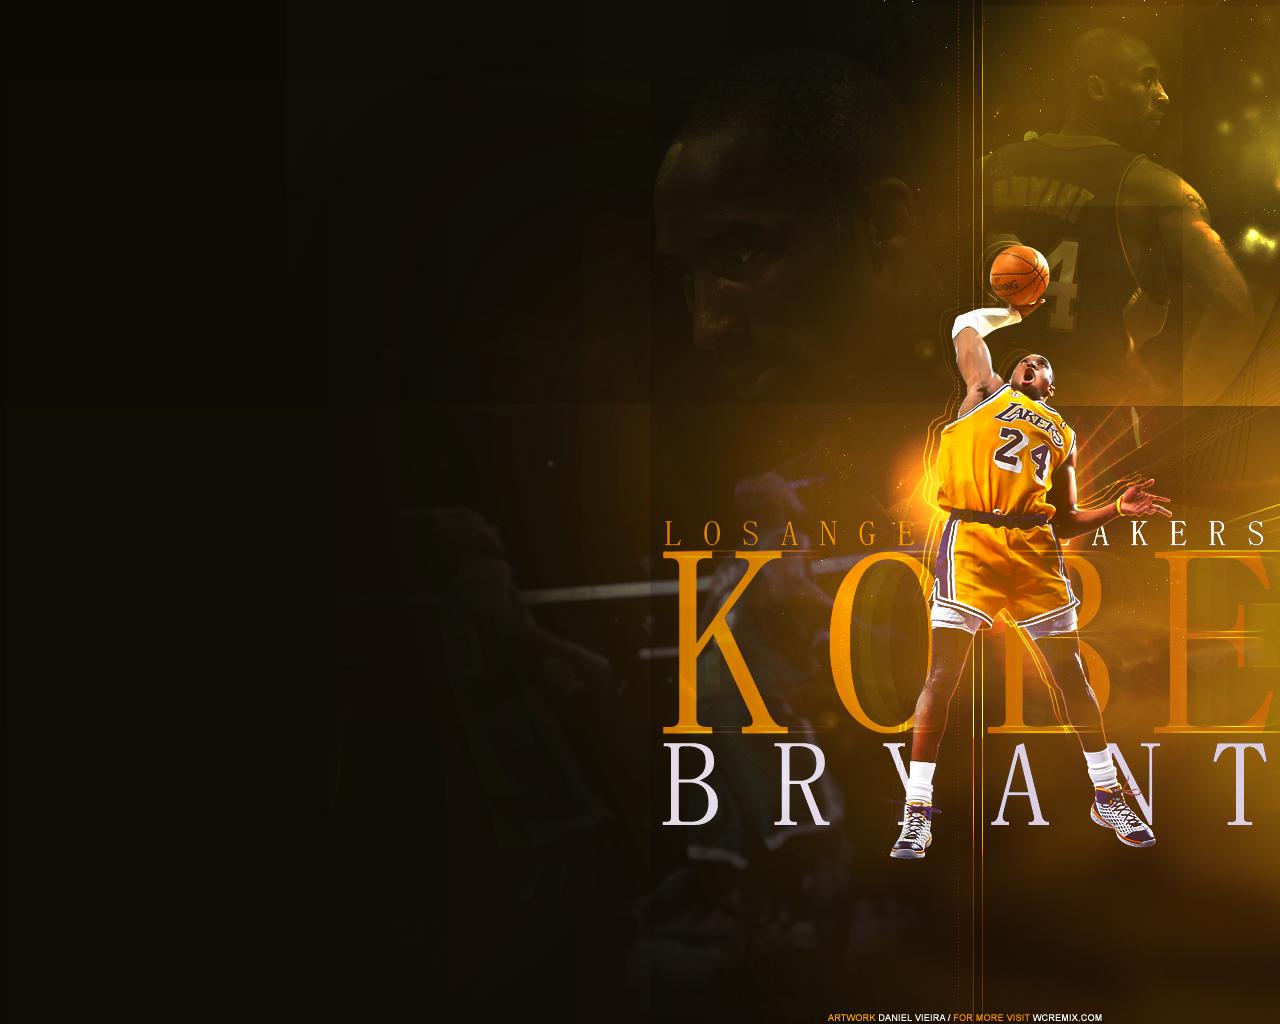 Kobe BRYANT by deejayvee